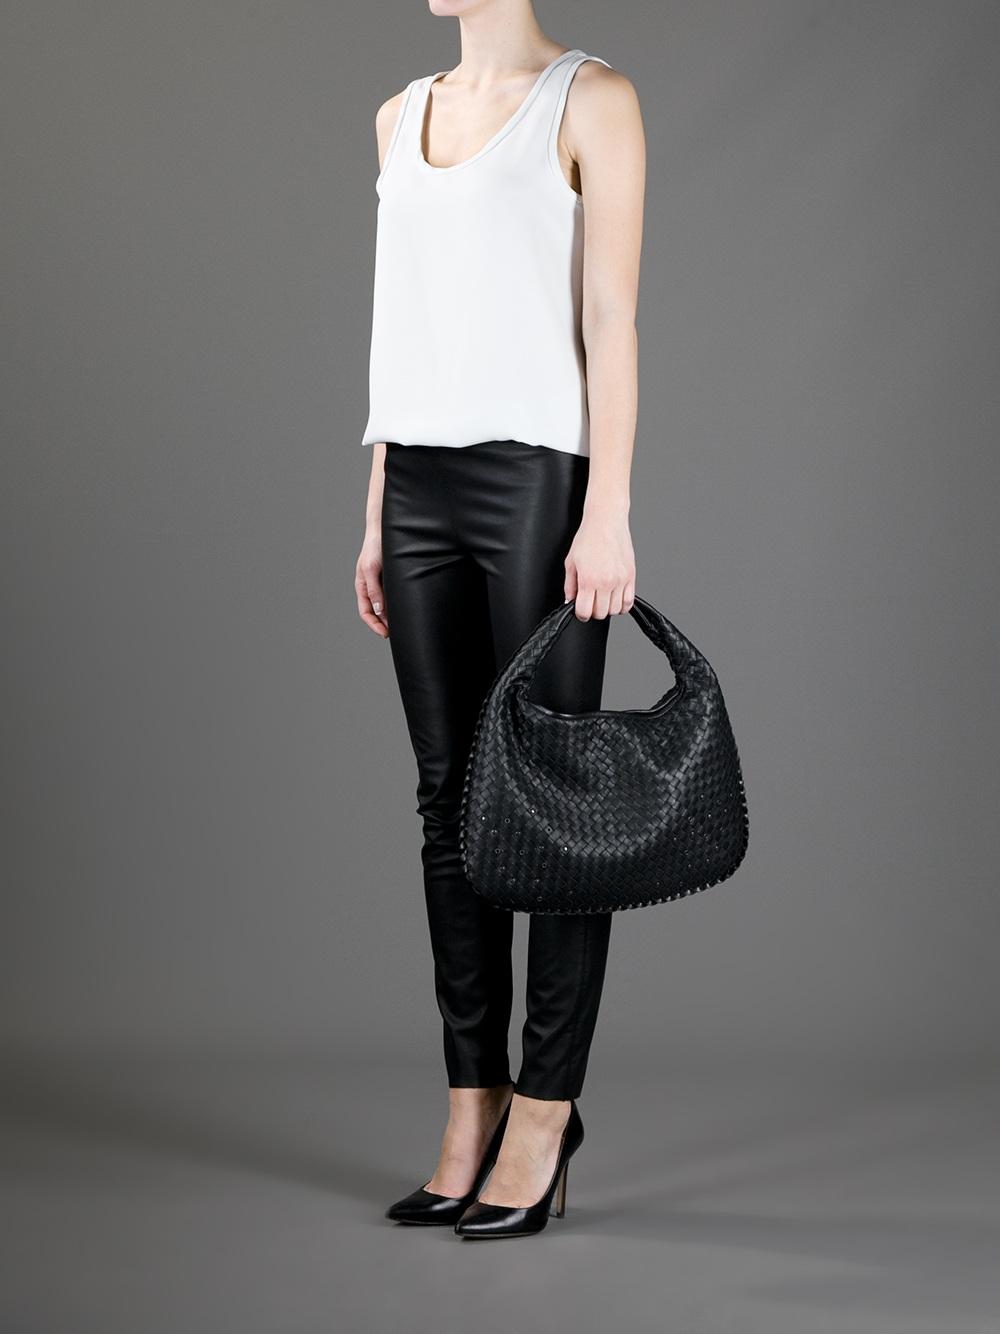 Bottega Veneta Large Hobo Bag